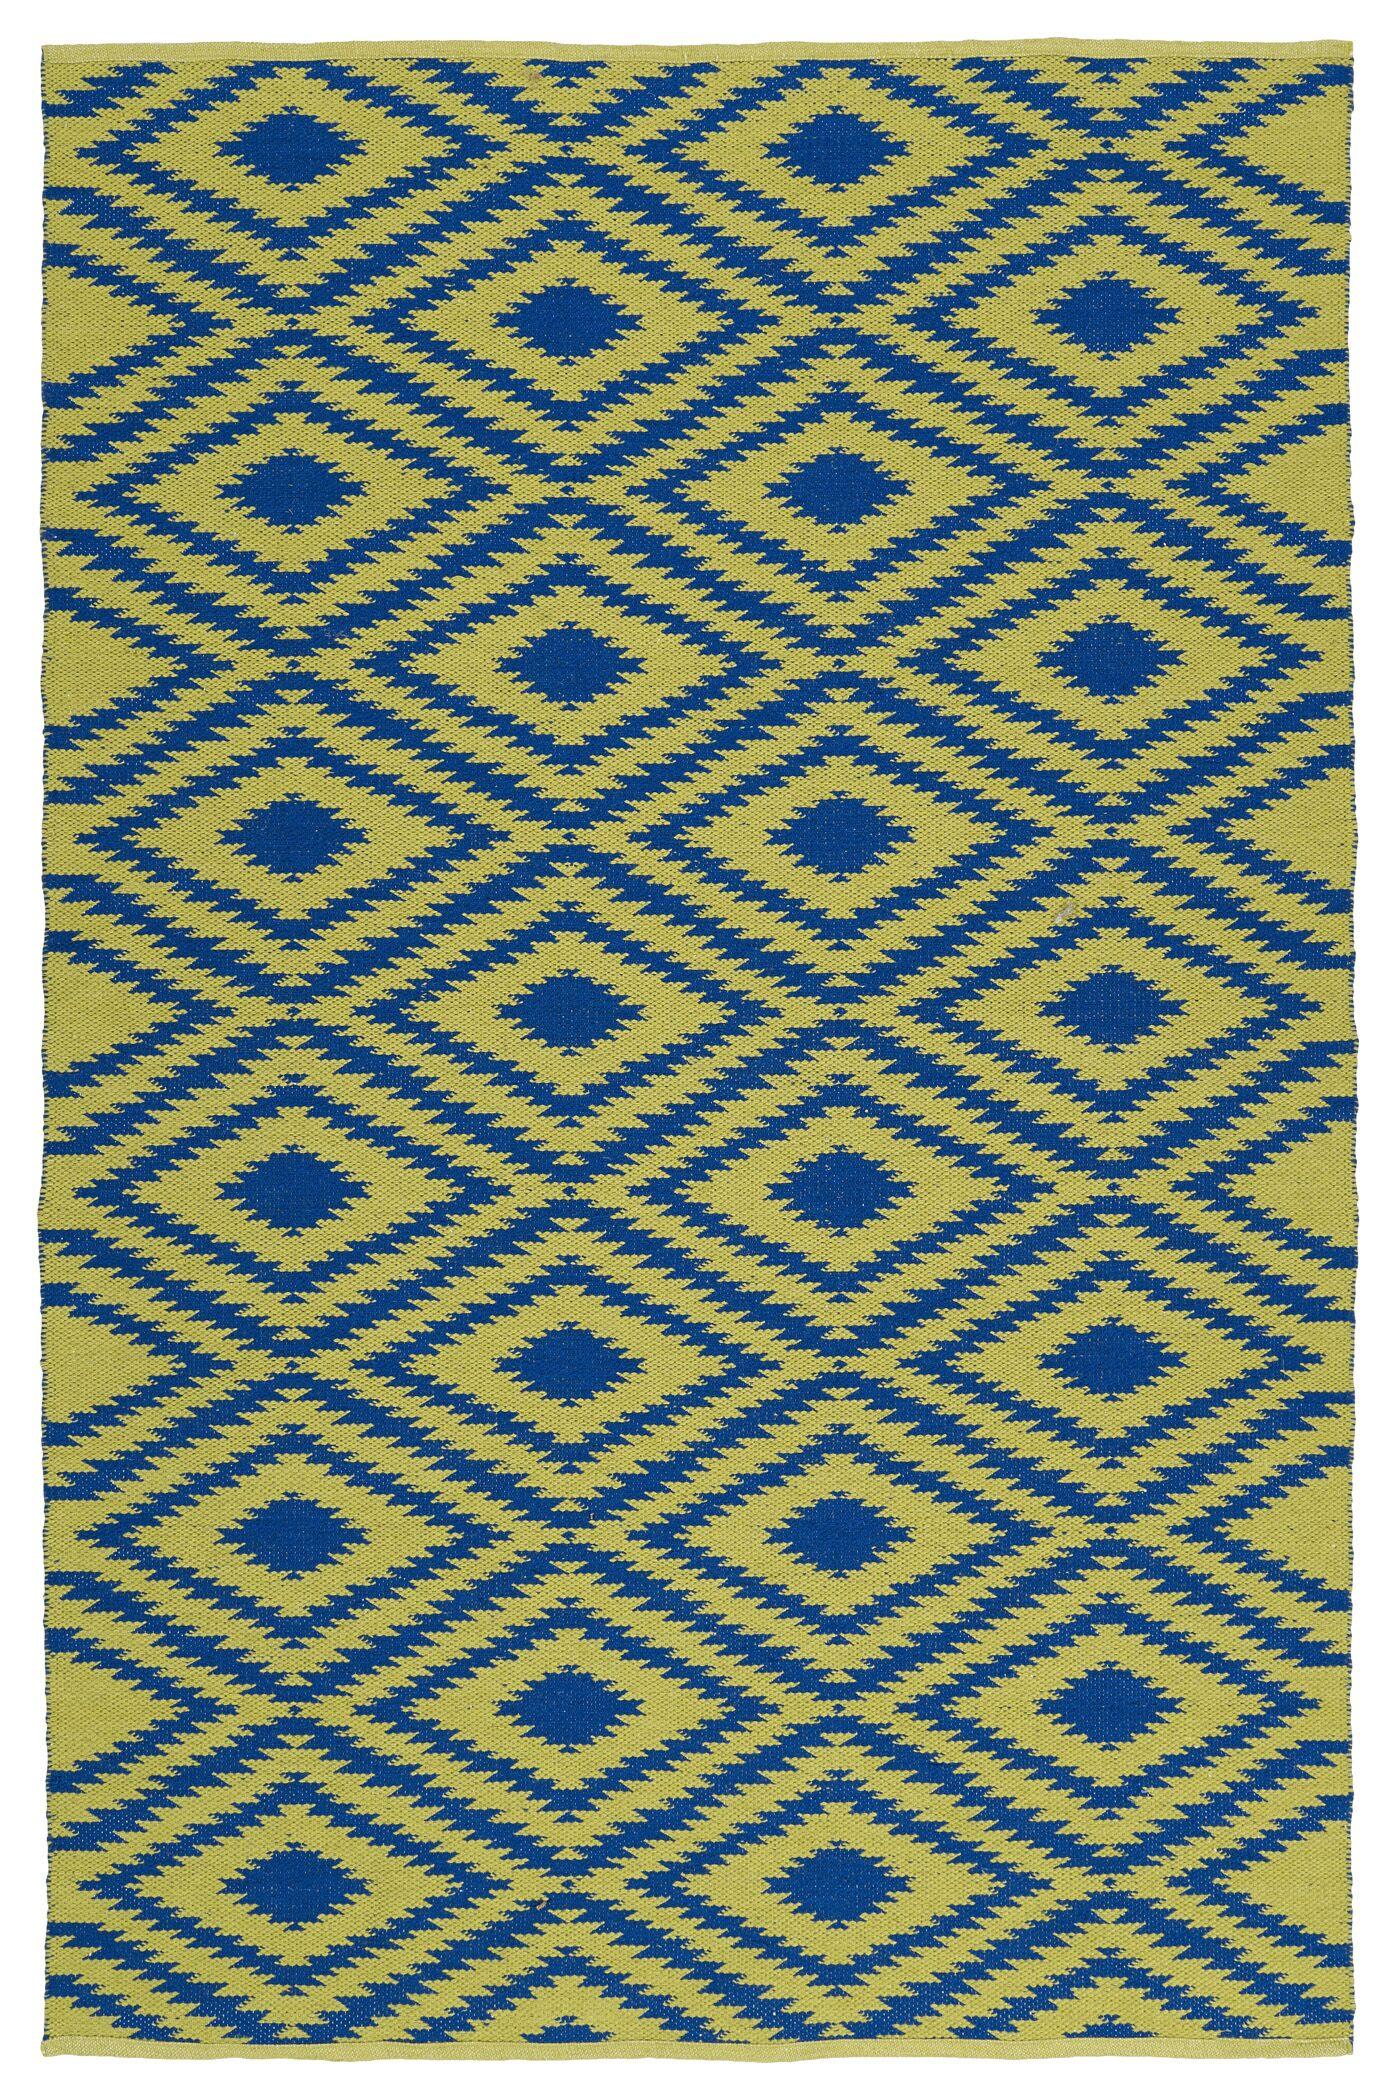 Greenfield Yellow/Navy Indoor/Outdoor Area Rug Rug Size: Rectangle 9' x 12'